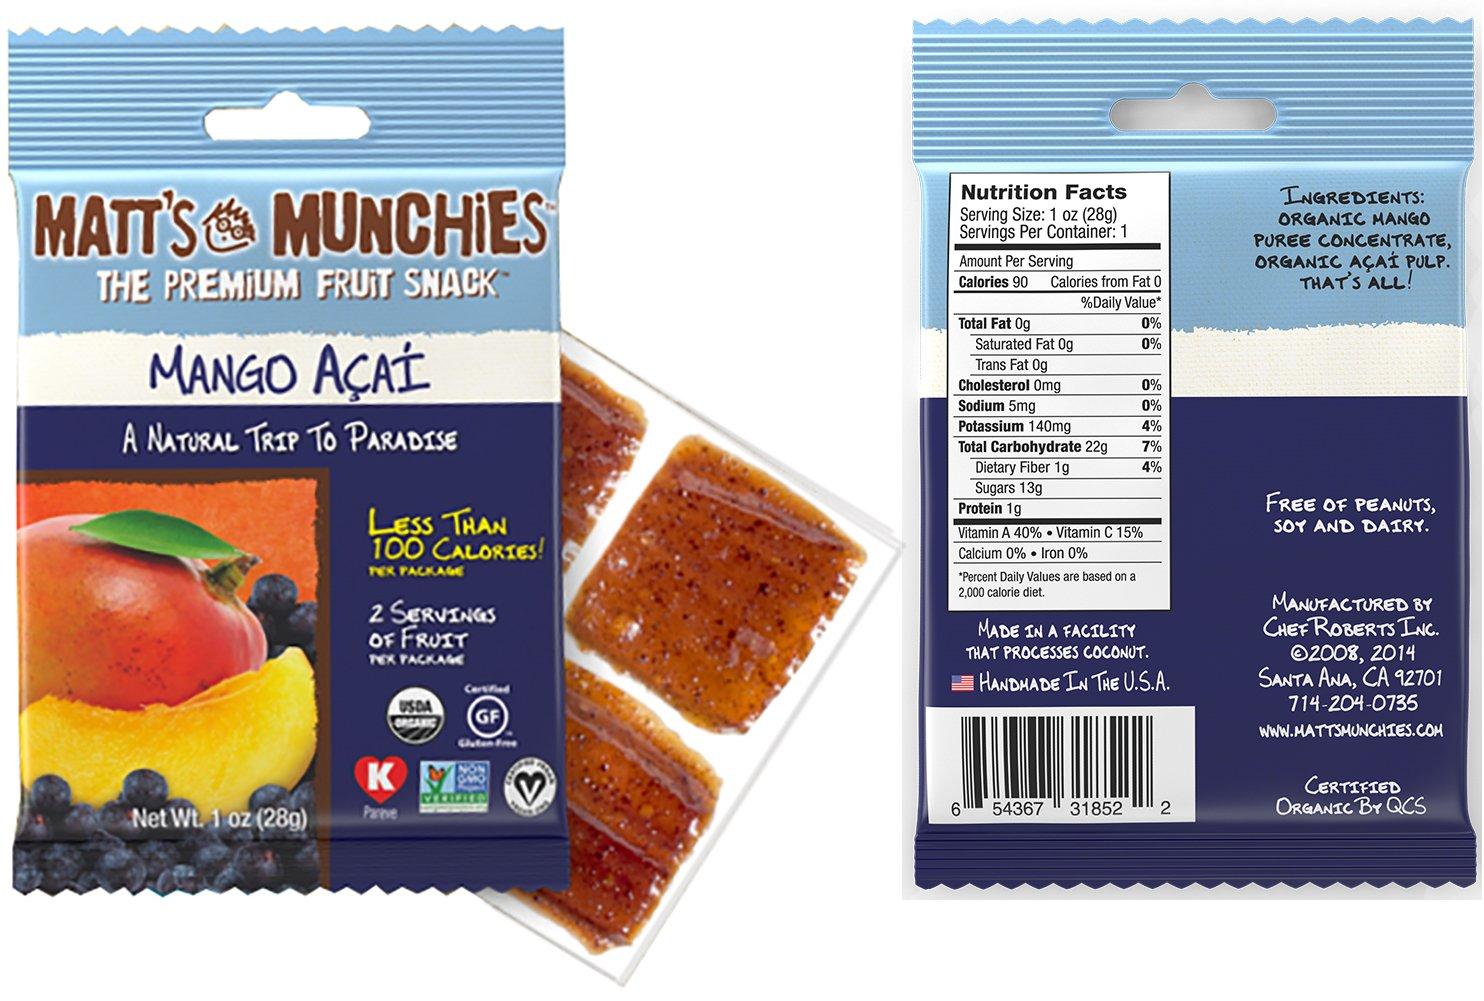 Matt's Munchies Tropical Assortment Organic Non-GMO Fruit Leather Peelable Fruit Snacks 25 Count Variety Pack Caddy - Mango, Island Mango, Tropical Punch, Banana Coconut & Apple by Matt's Munchies (Image #6)